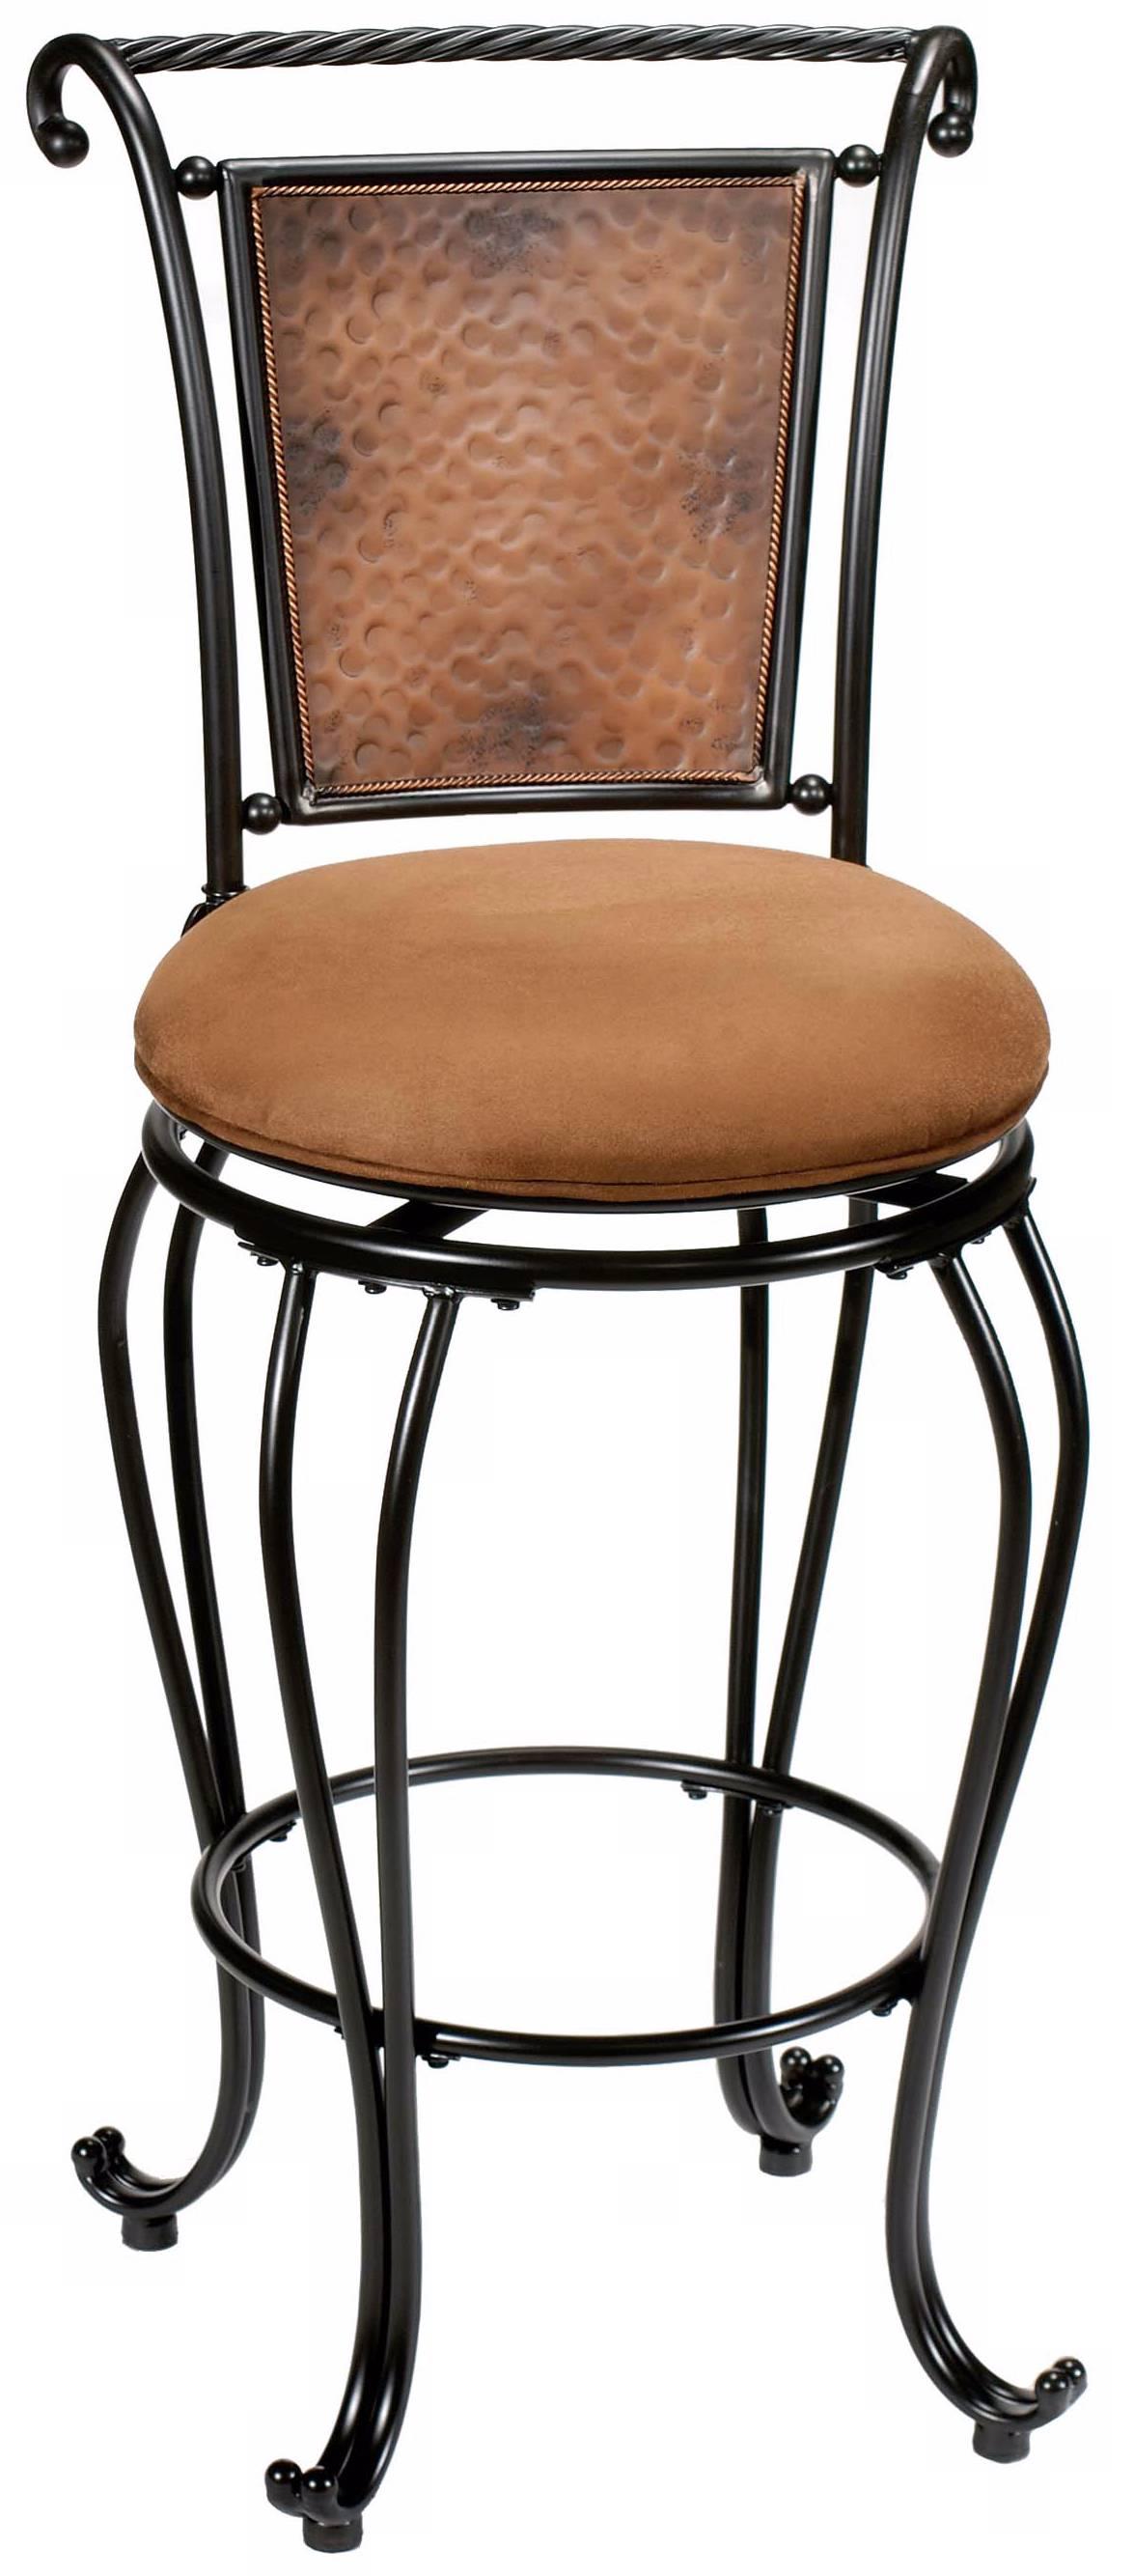 Seiling Tufted Petite Upholstered Vanity Stool 4m399